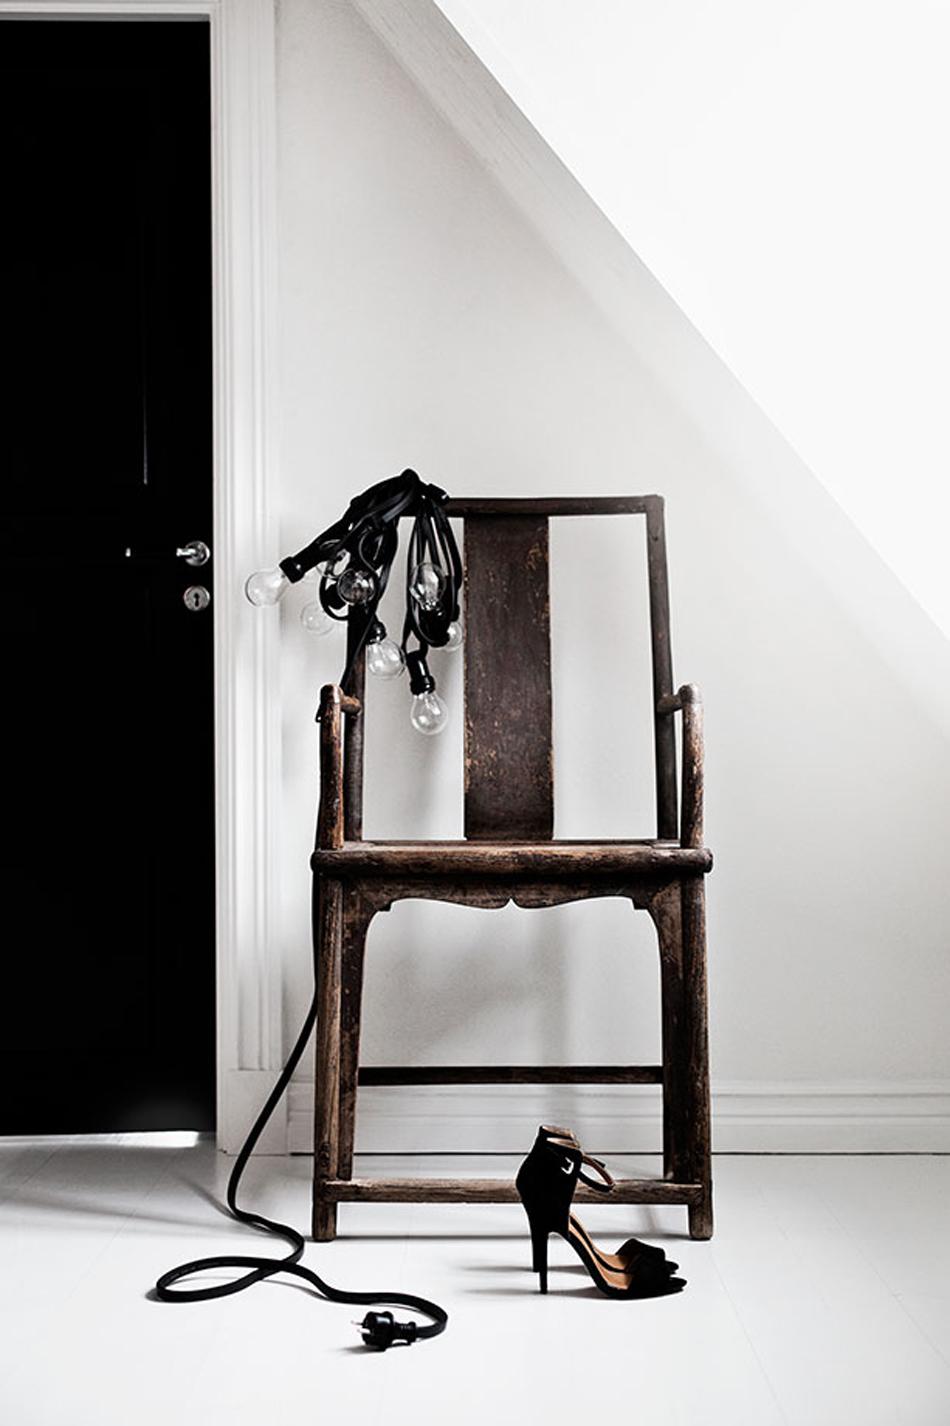 fringe-and-doll-hemma-hos-fru-stilista-stol